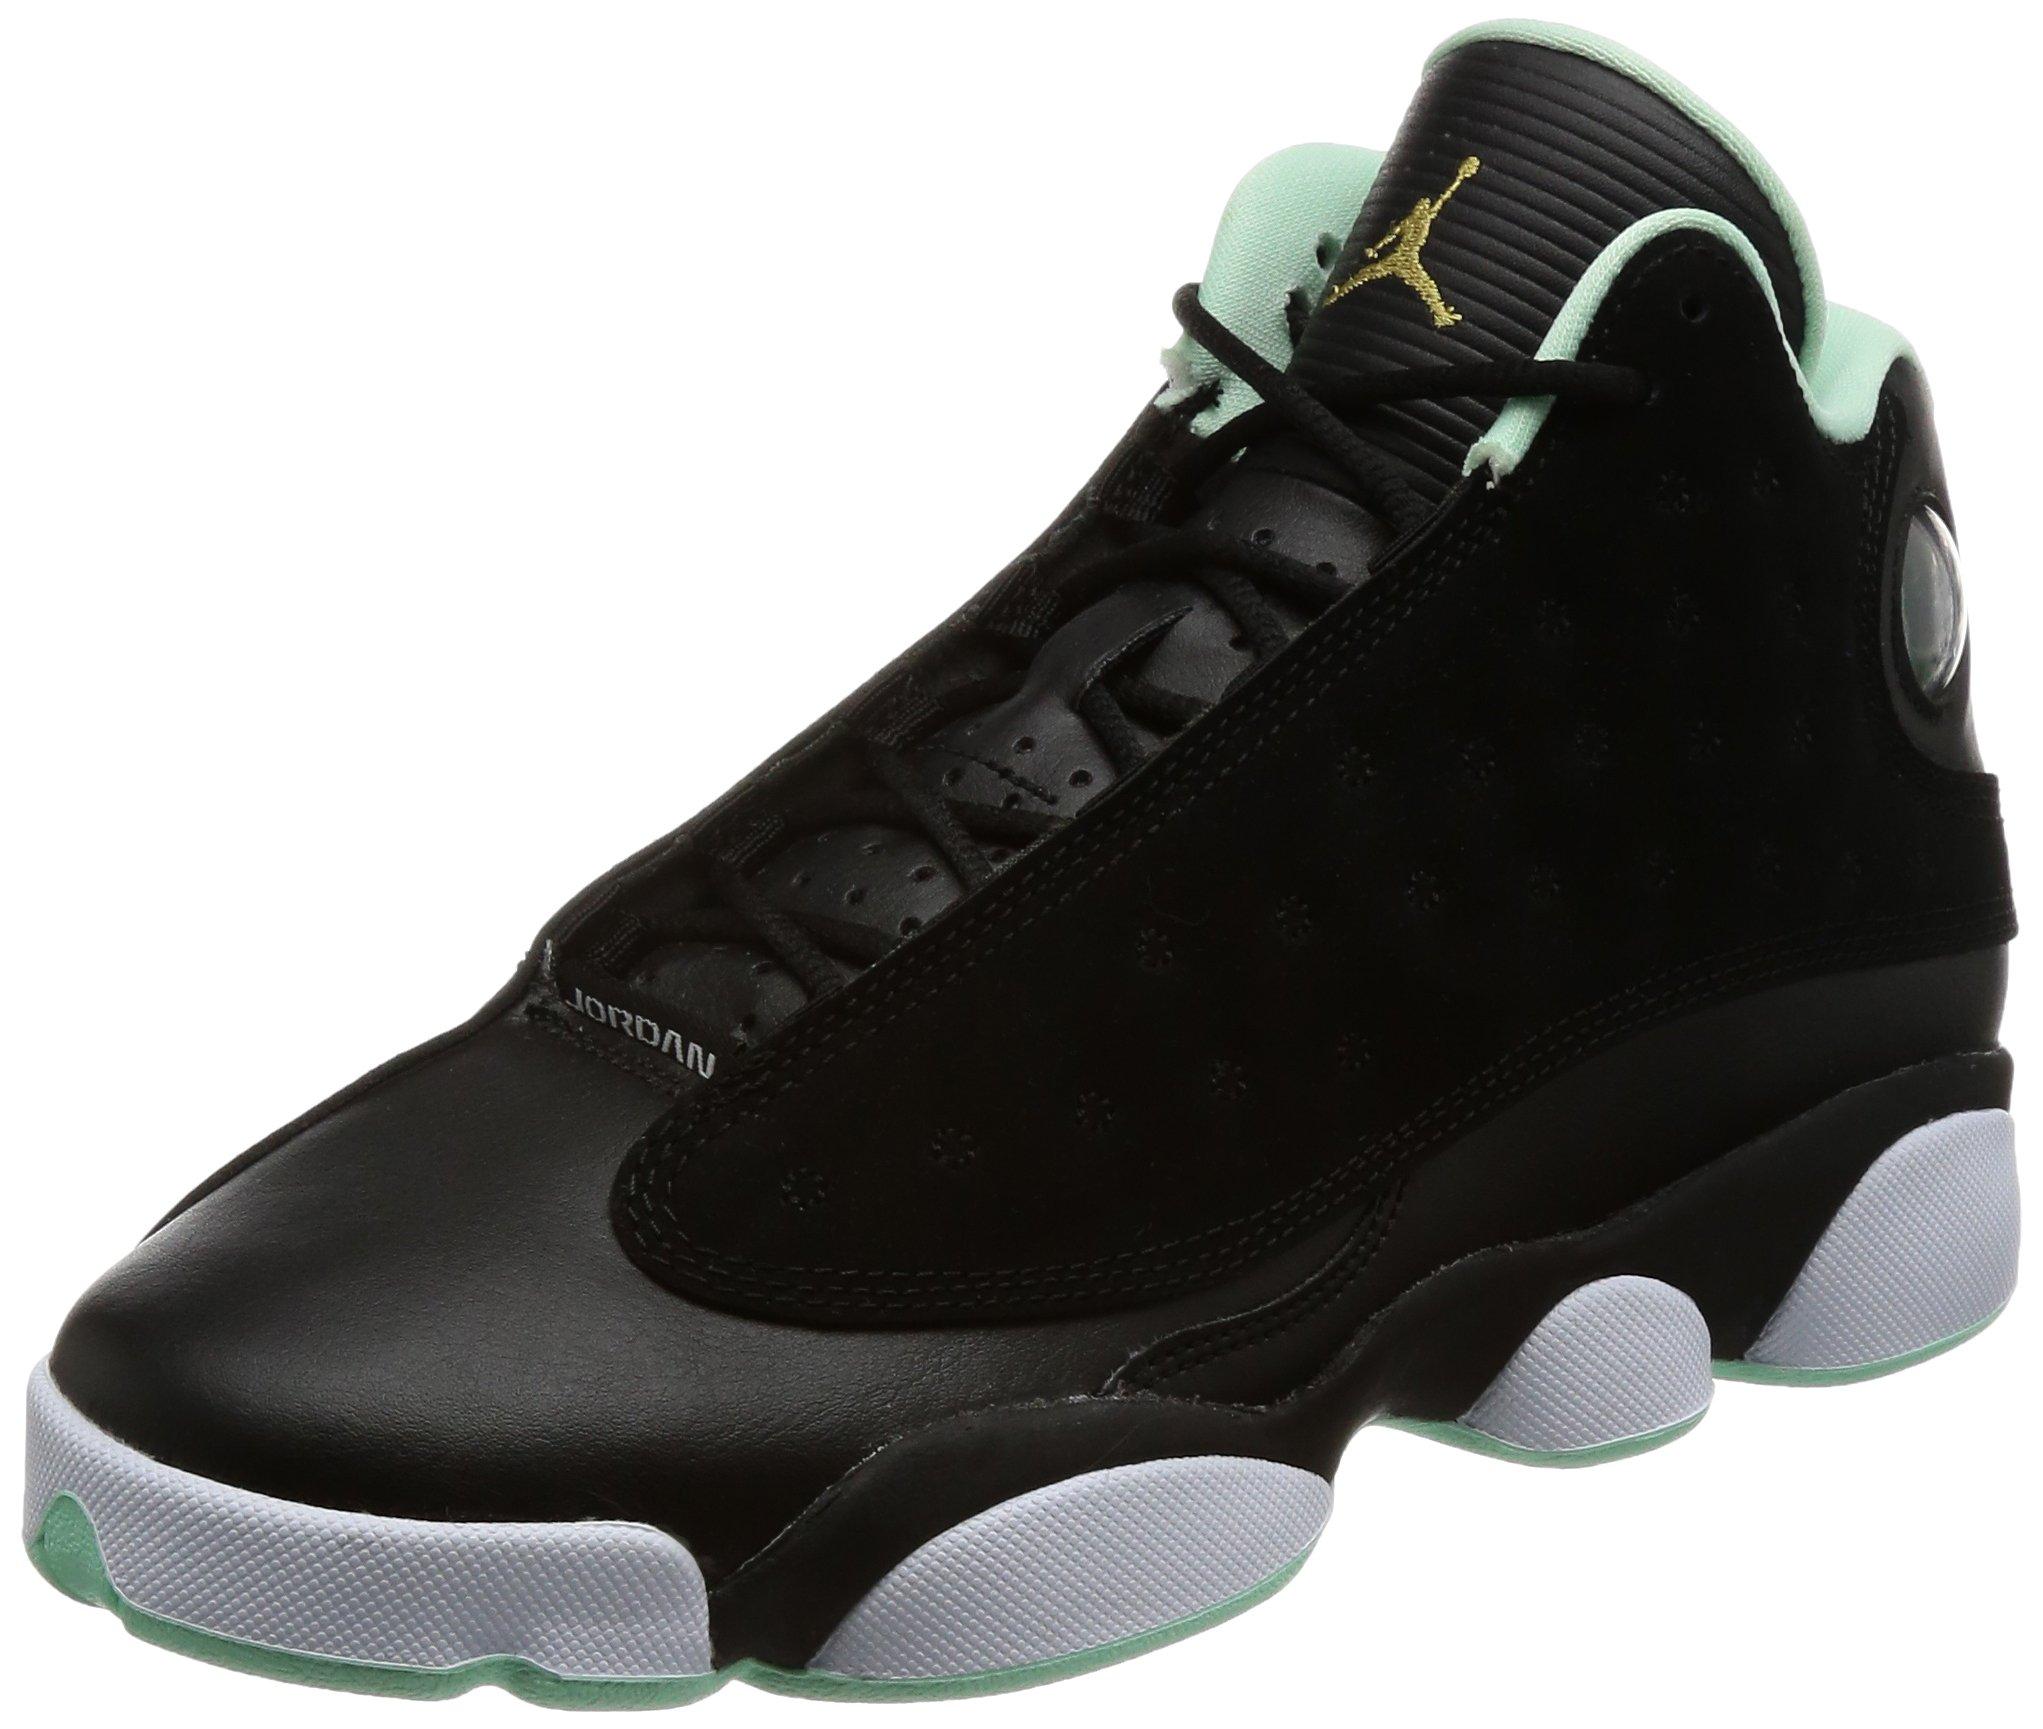 Jordan Air Retro 13 GG Big Kid's Shoes Black/Metallic Gold/Mint Foam 439358-015 (6.5 M US) by Jordan